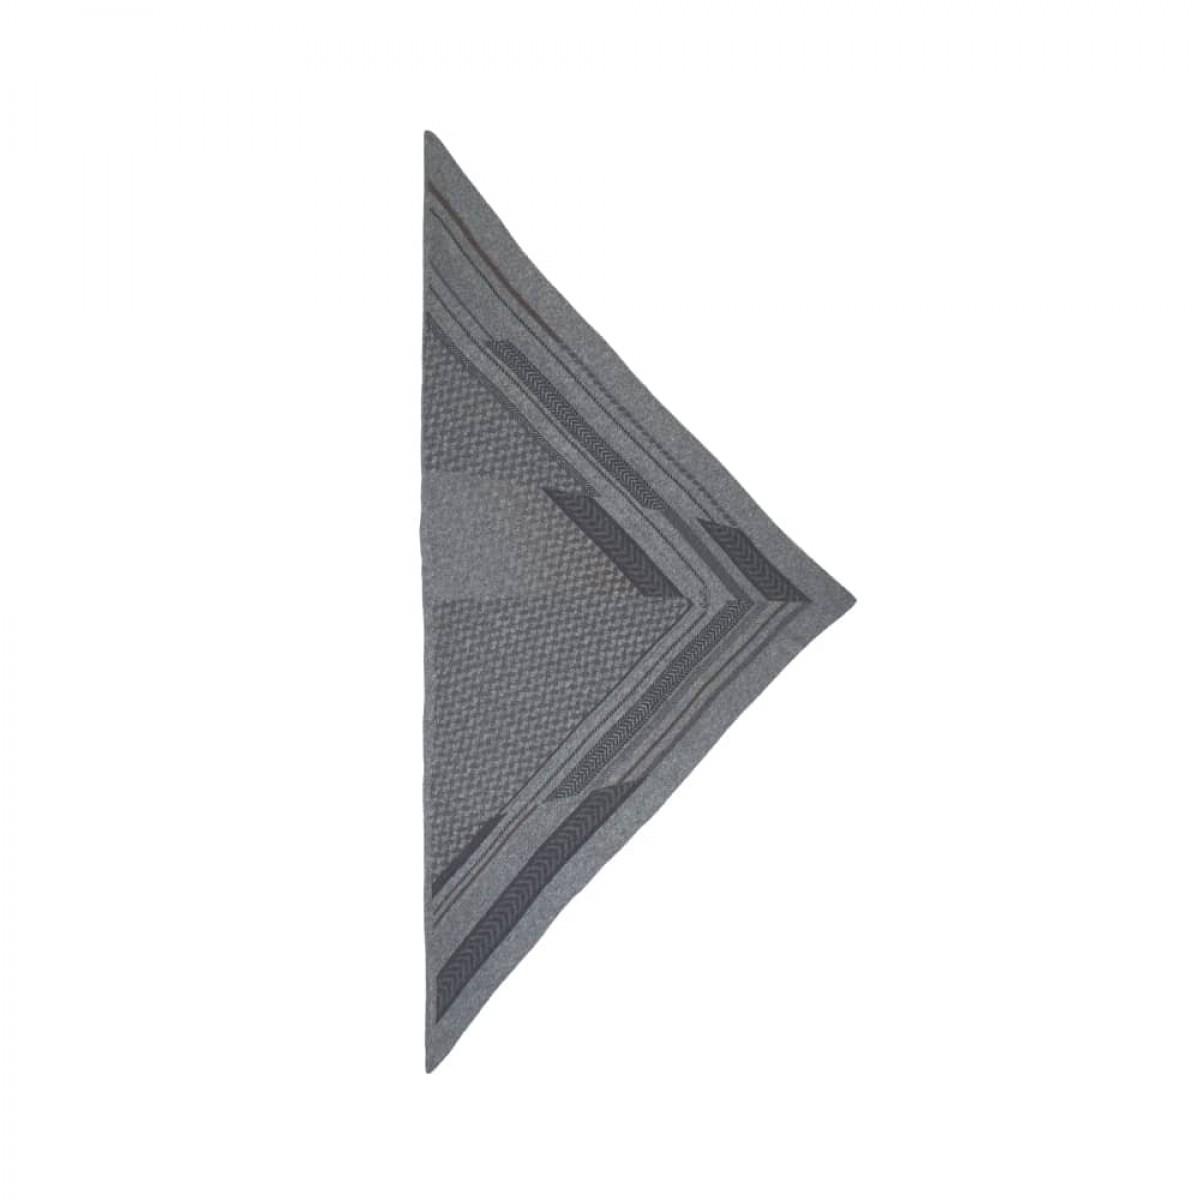 triangle kufiya double - city kufiya mixed - front